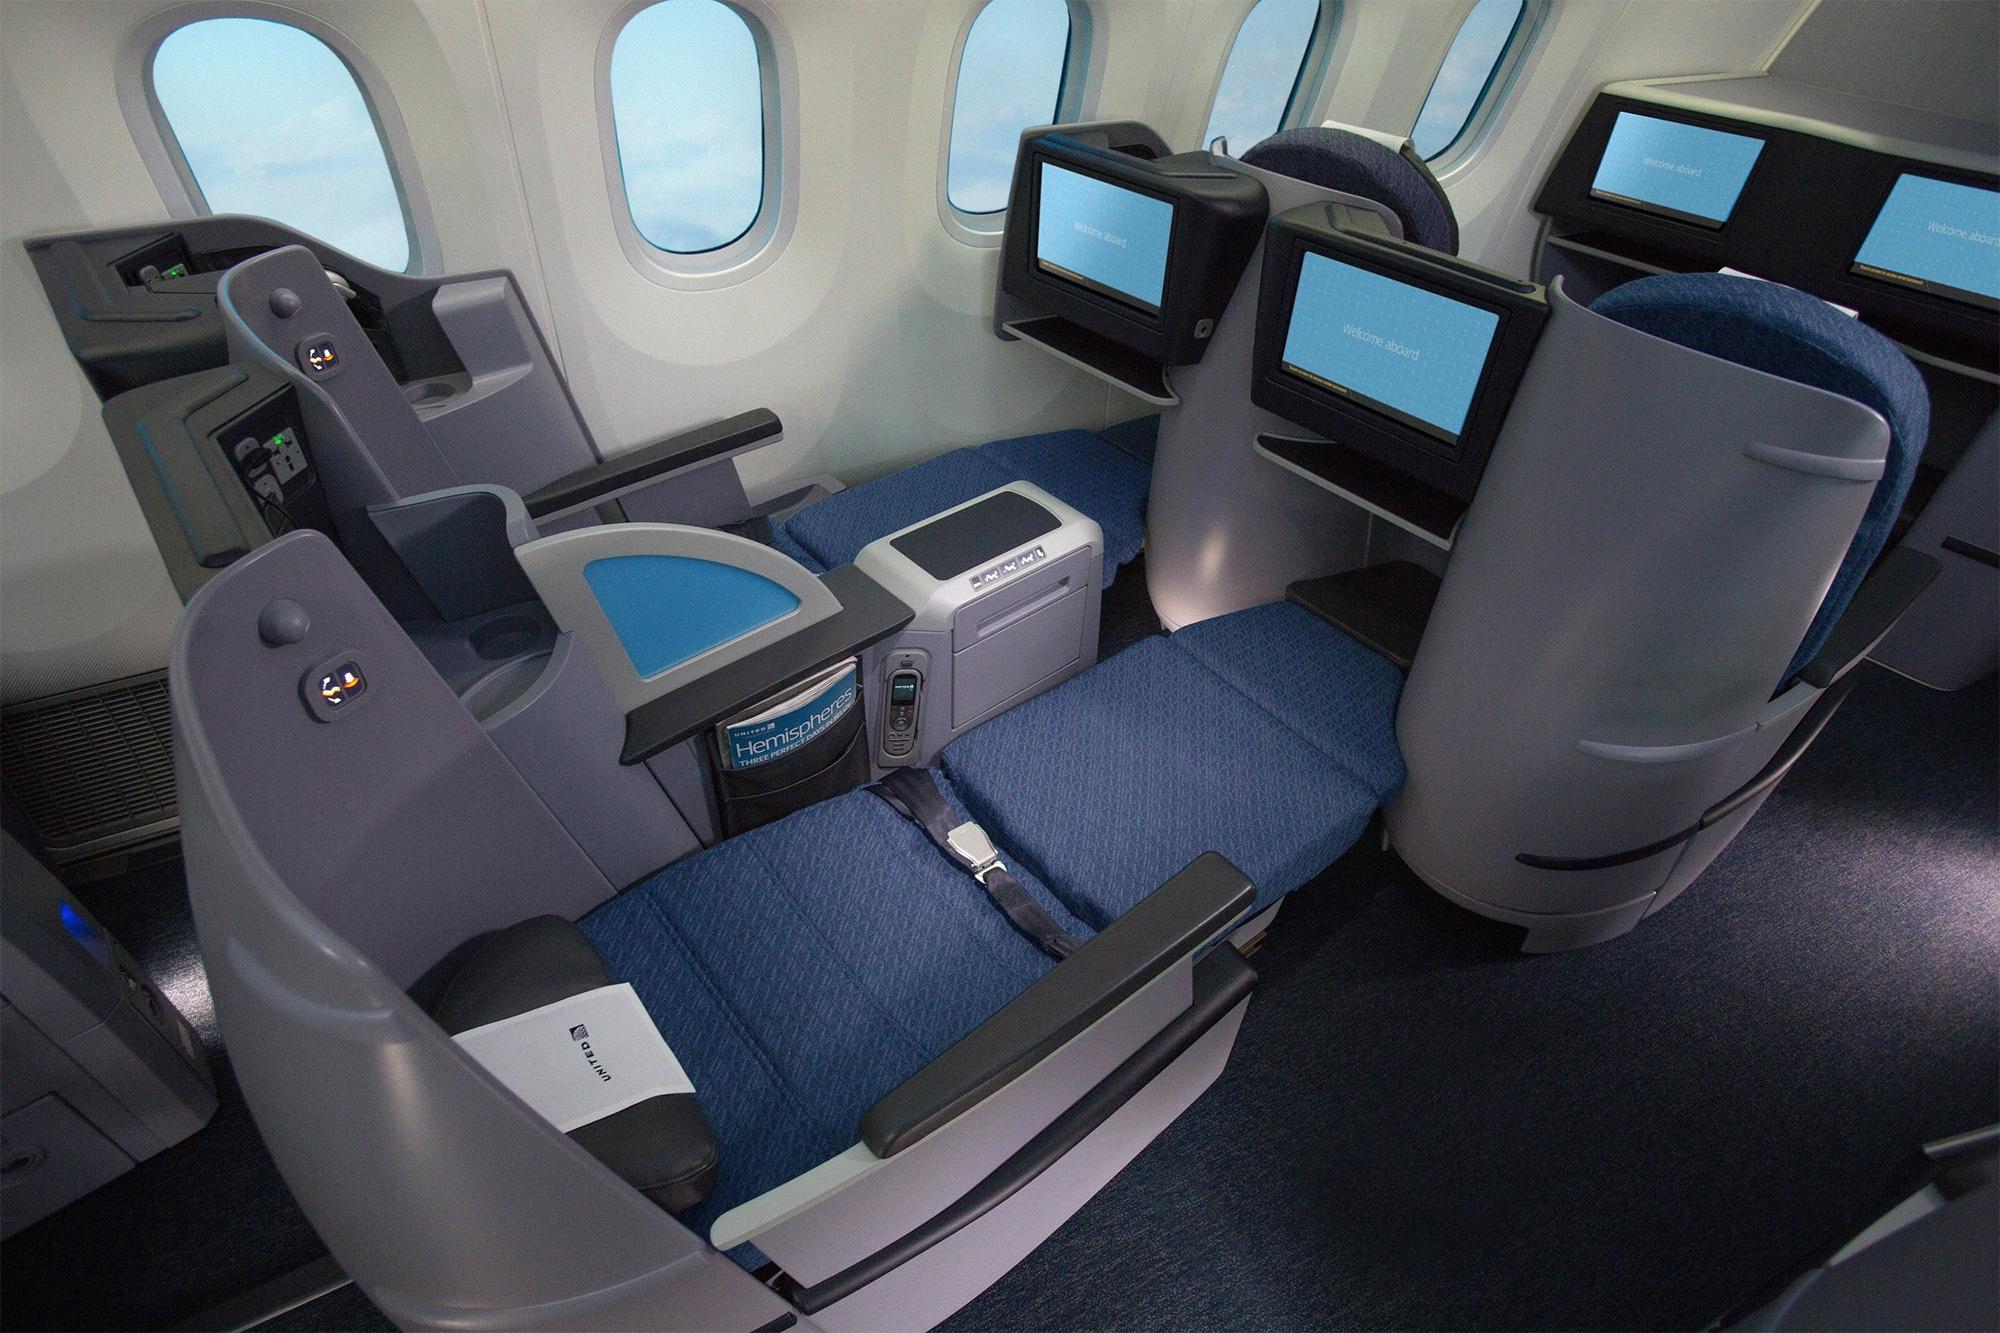 System glitch: KrisFlyer awards on United are charging by flight segment